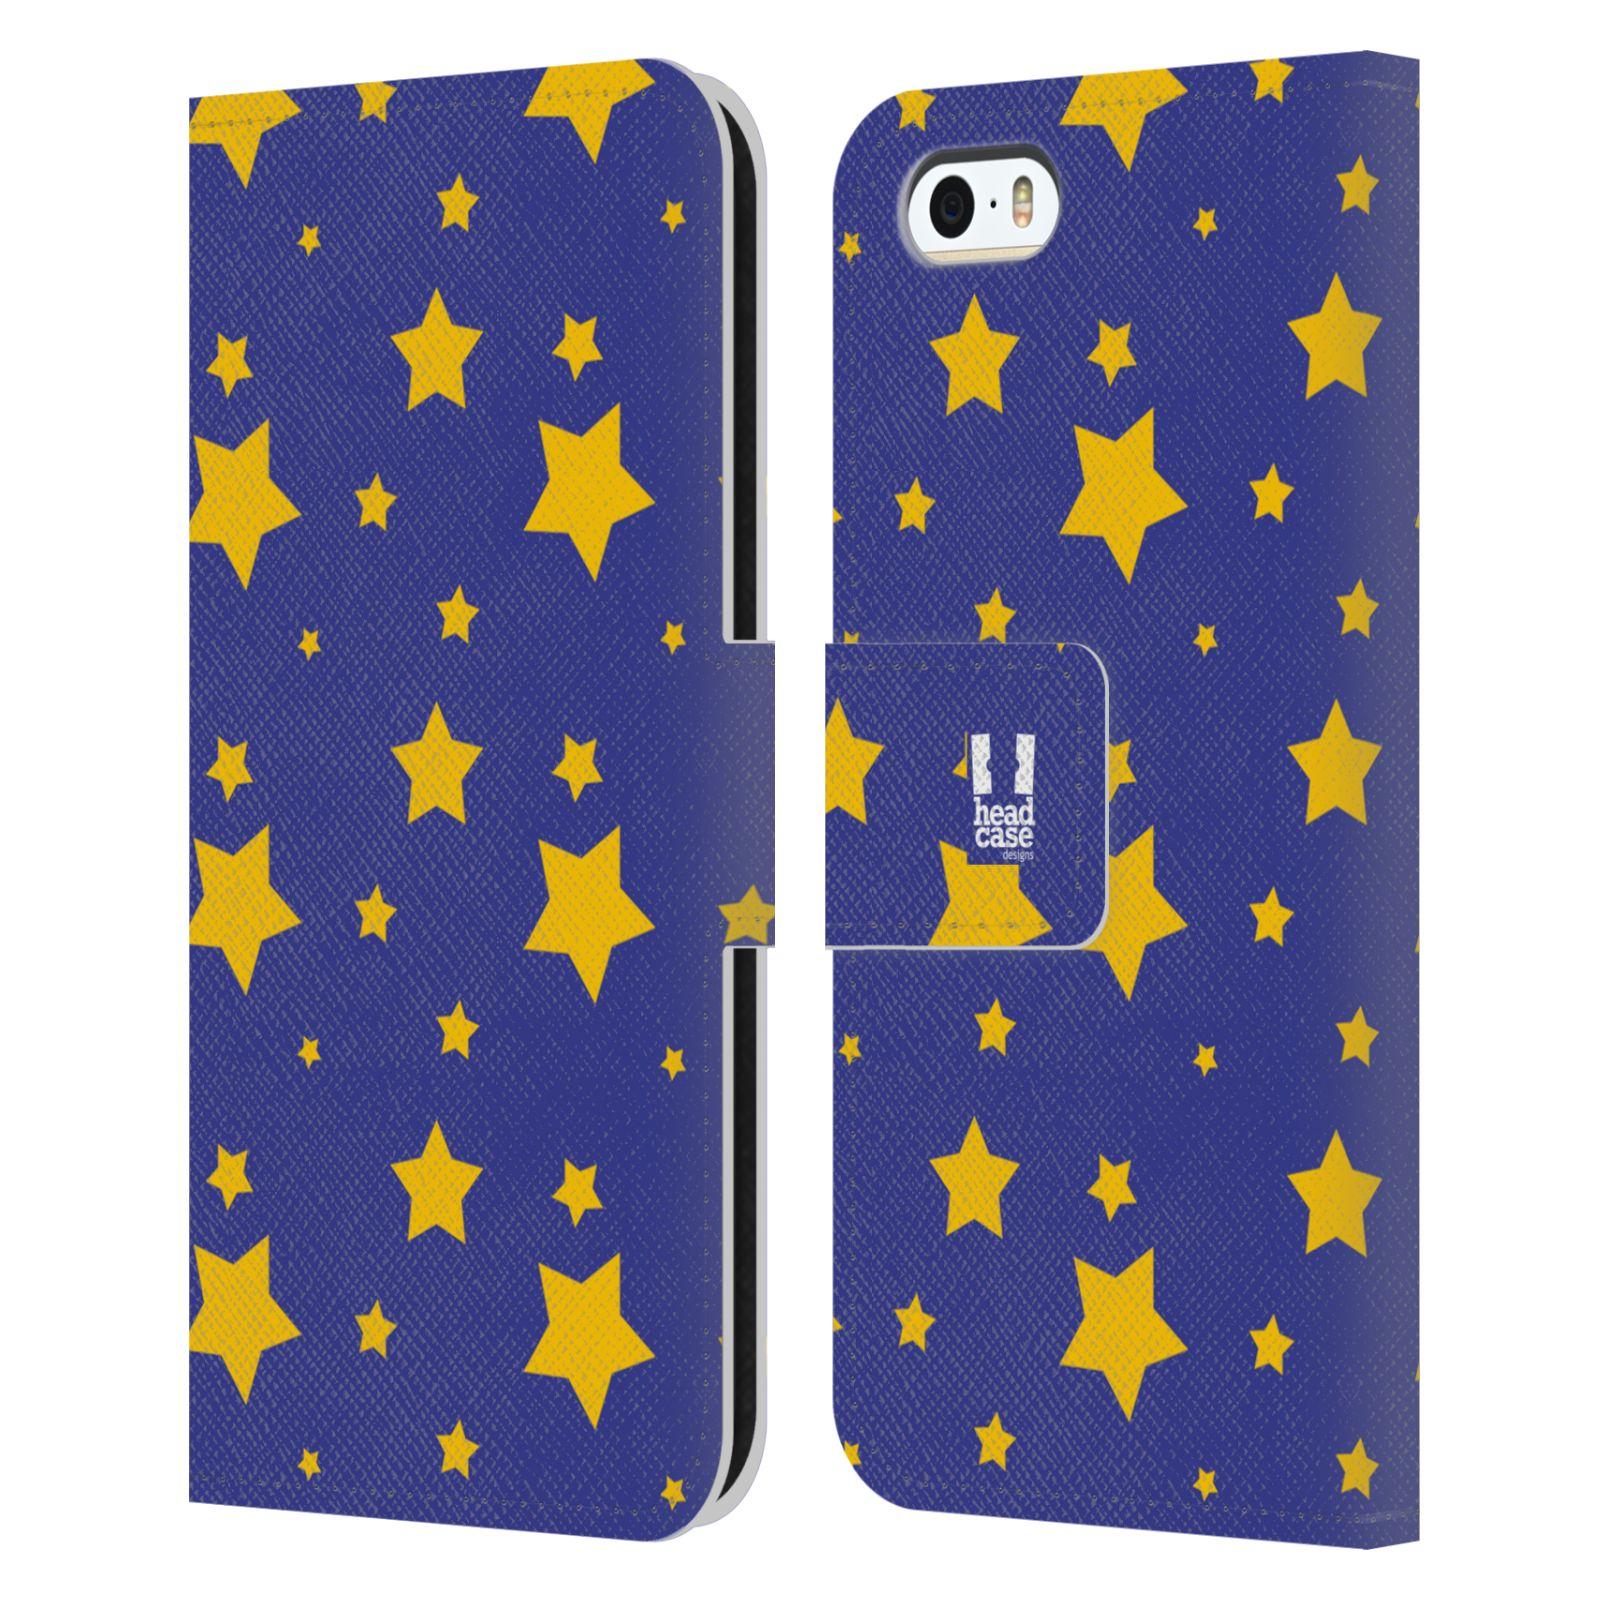 HEAD CASE Flipové pouzdro pro mobil Apple Iphone 5/5s vzor hvězdičky modrá a žlutá